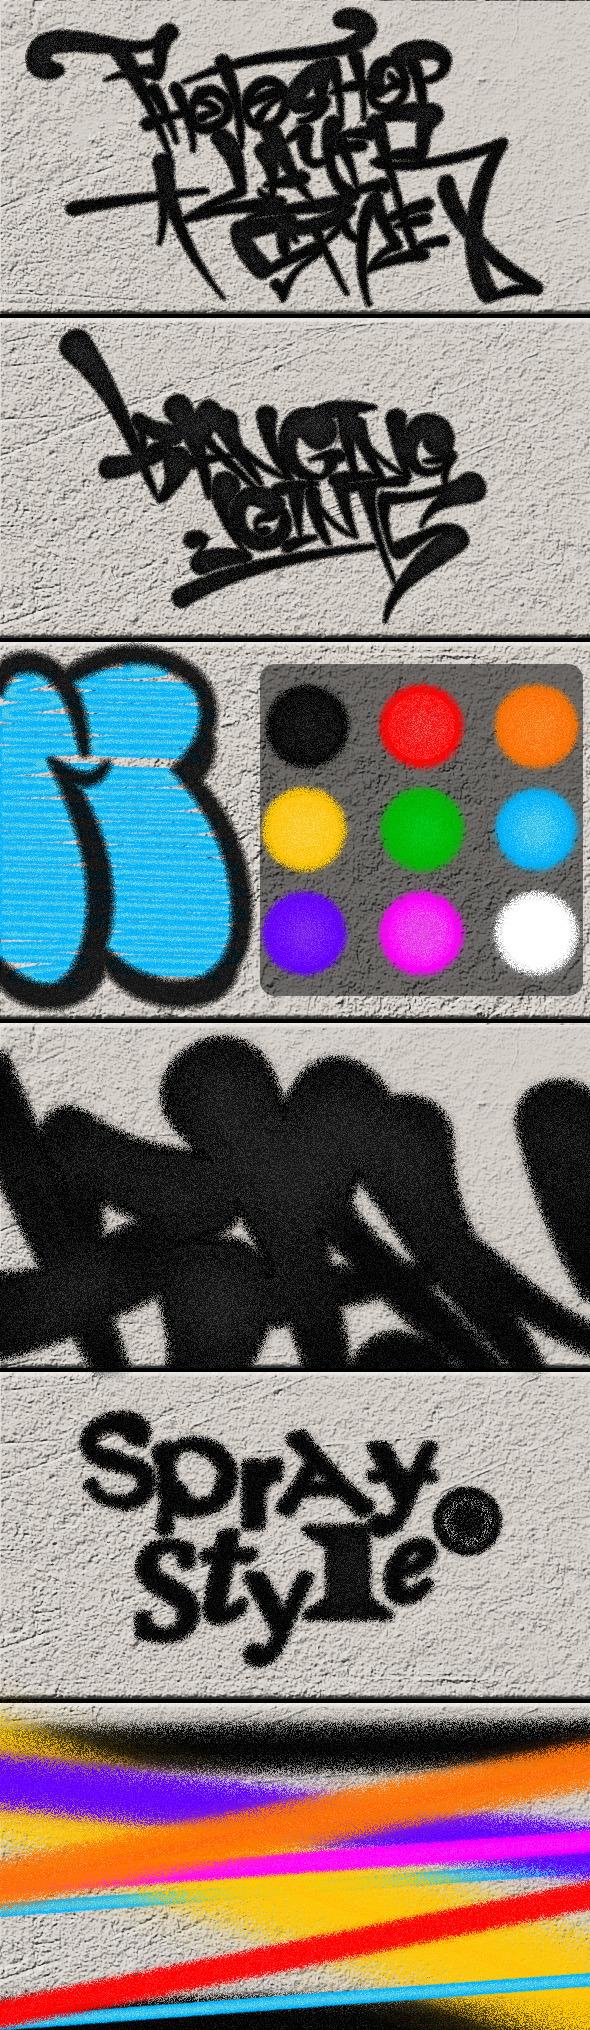 Spray Photoshop Styles - Styles Photoshop